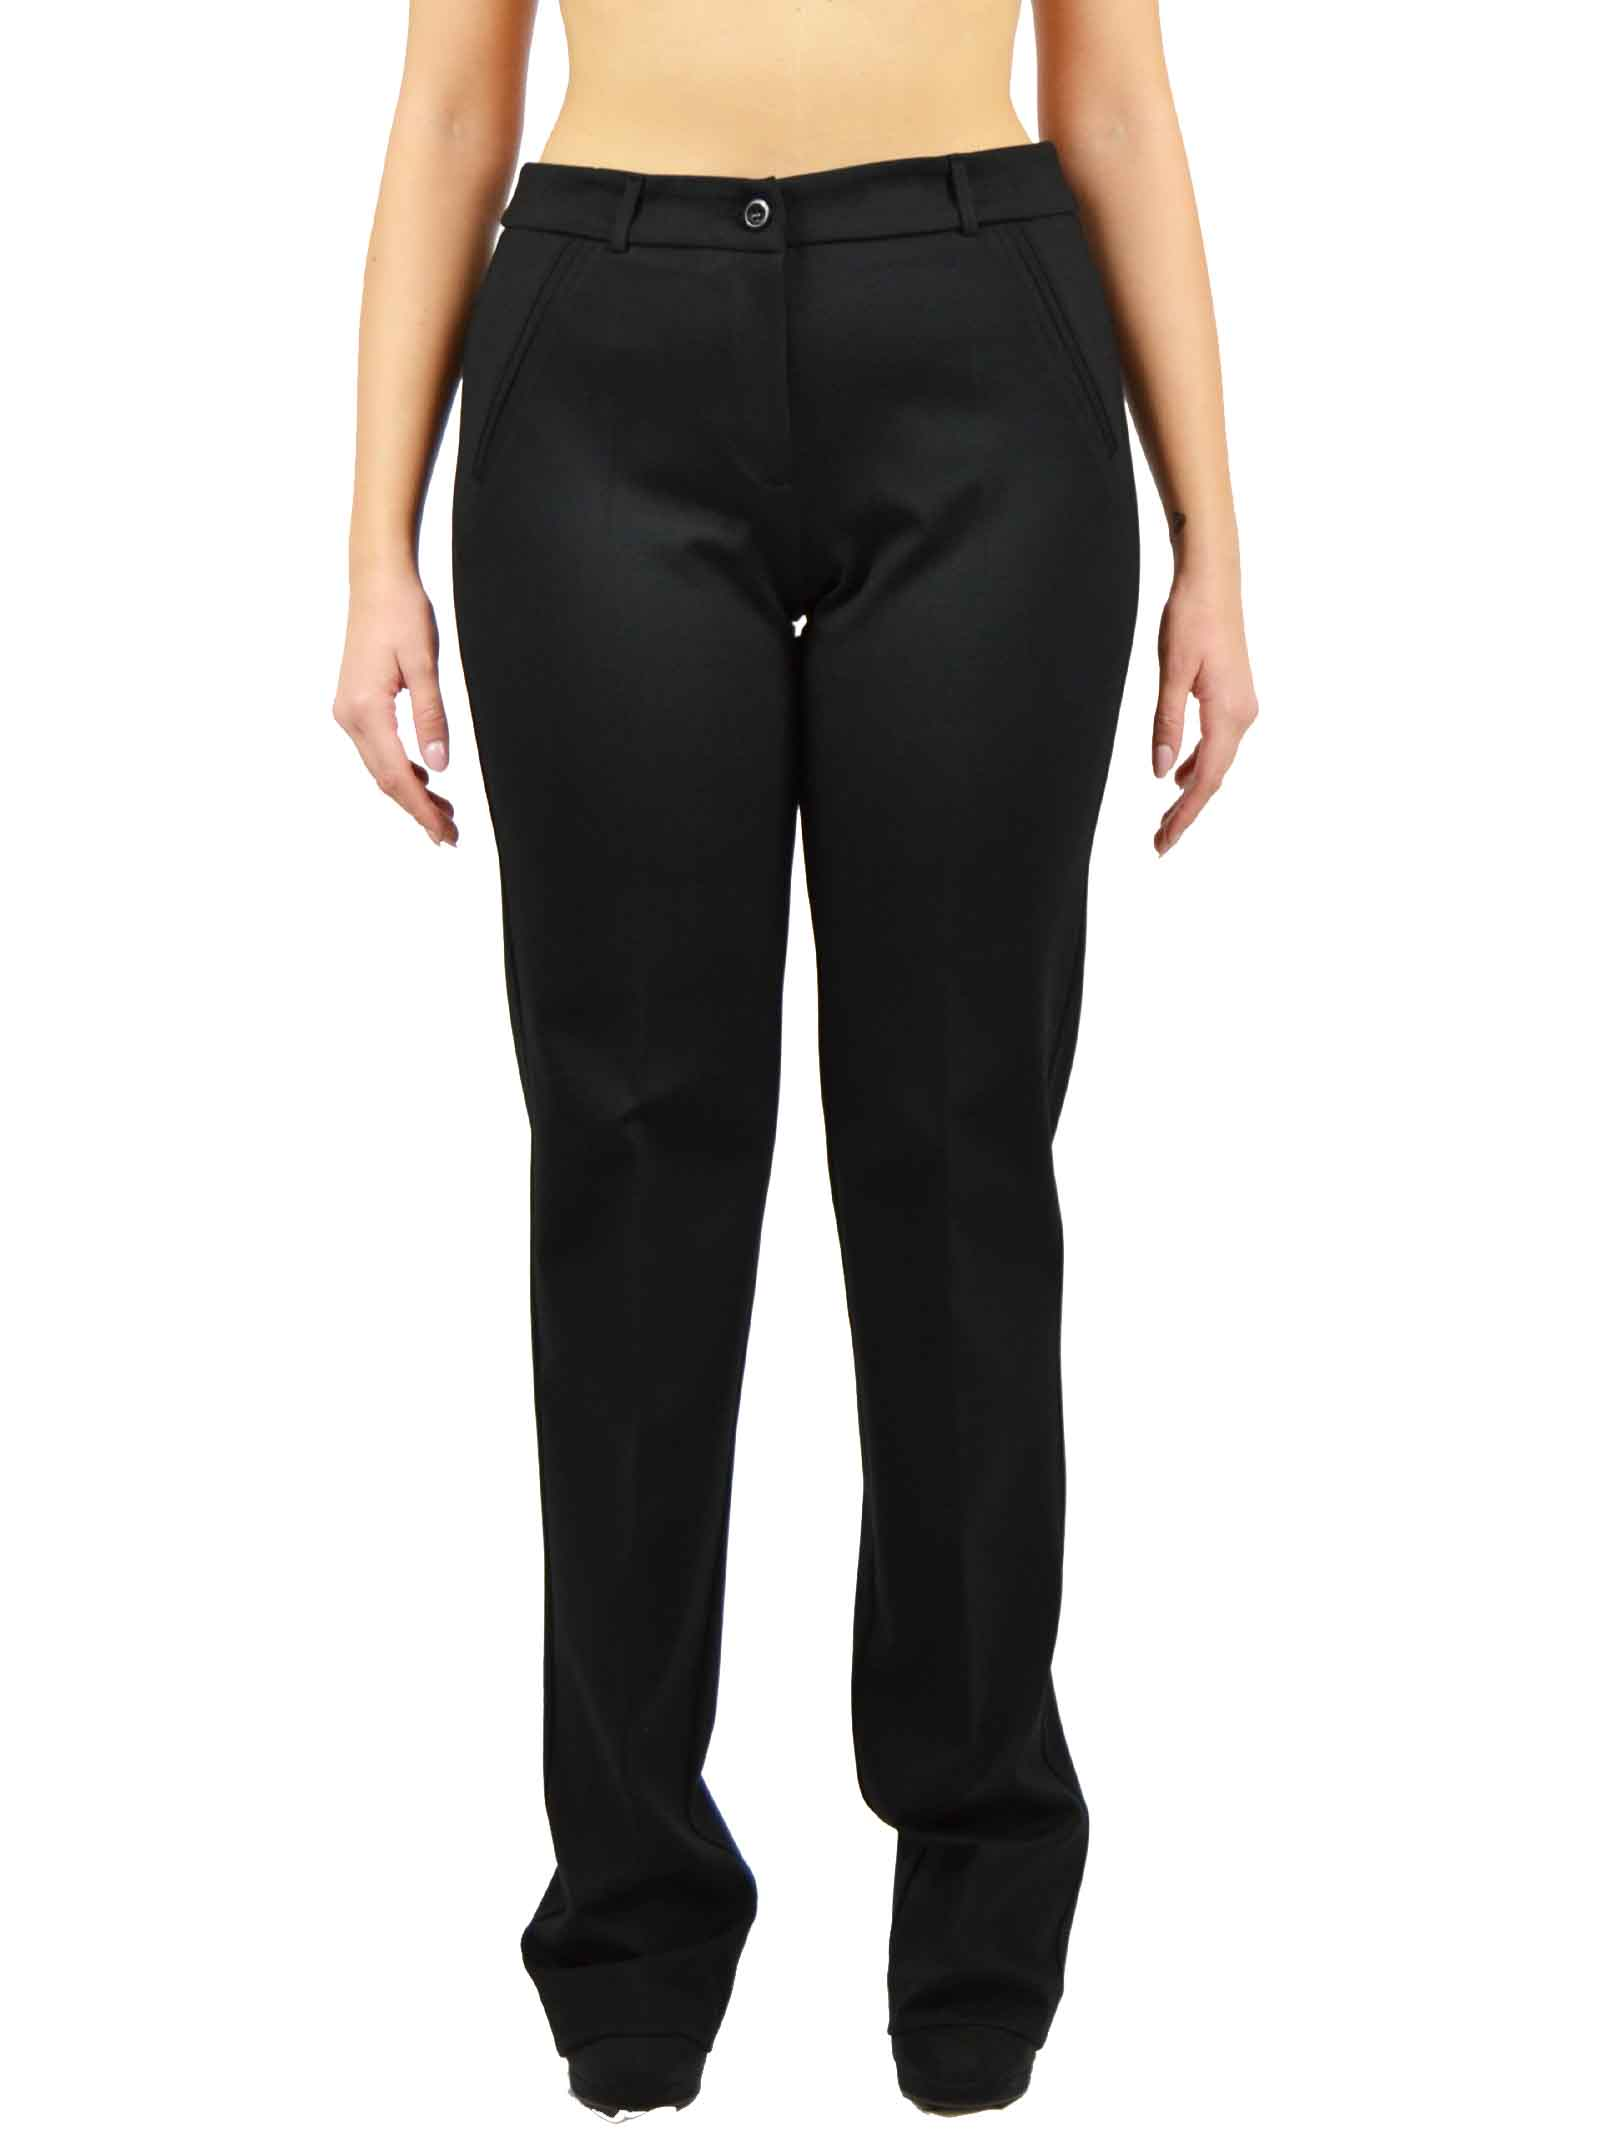 Pants with bustier, BENEDETTA VALERI |  | PEPILLO01